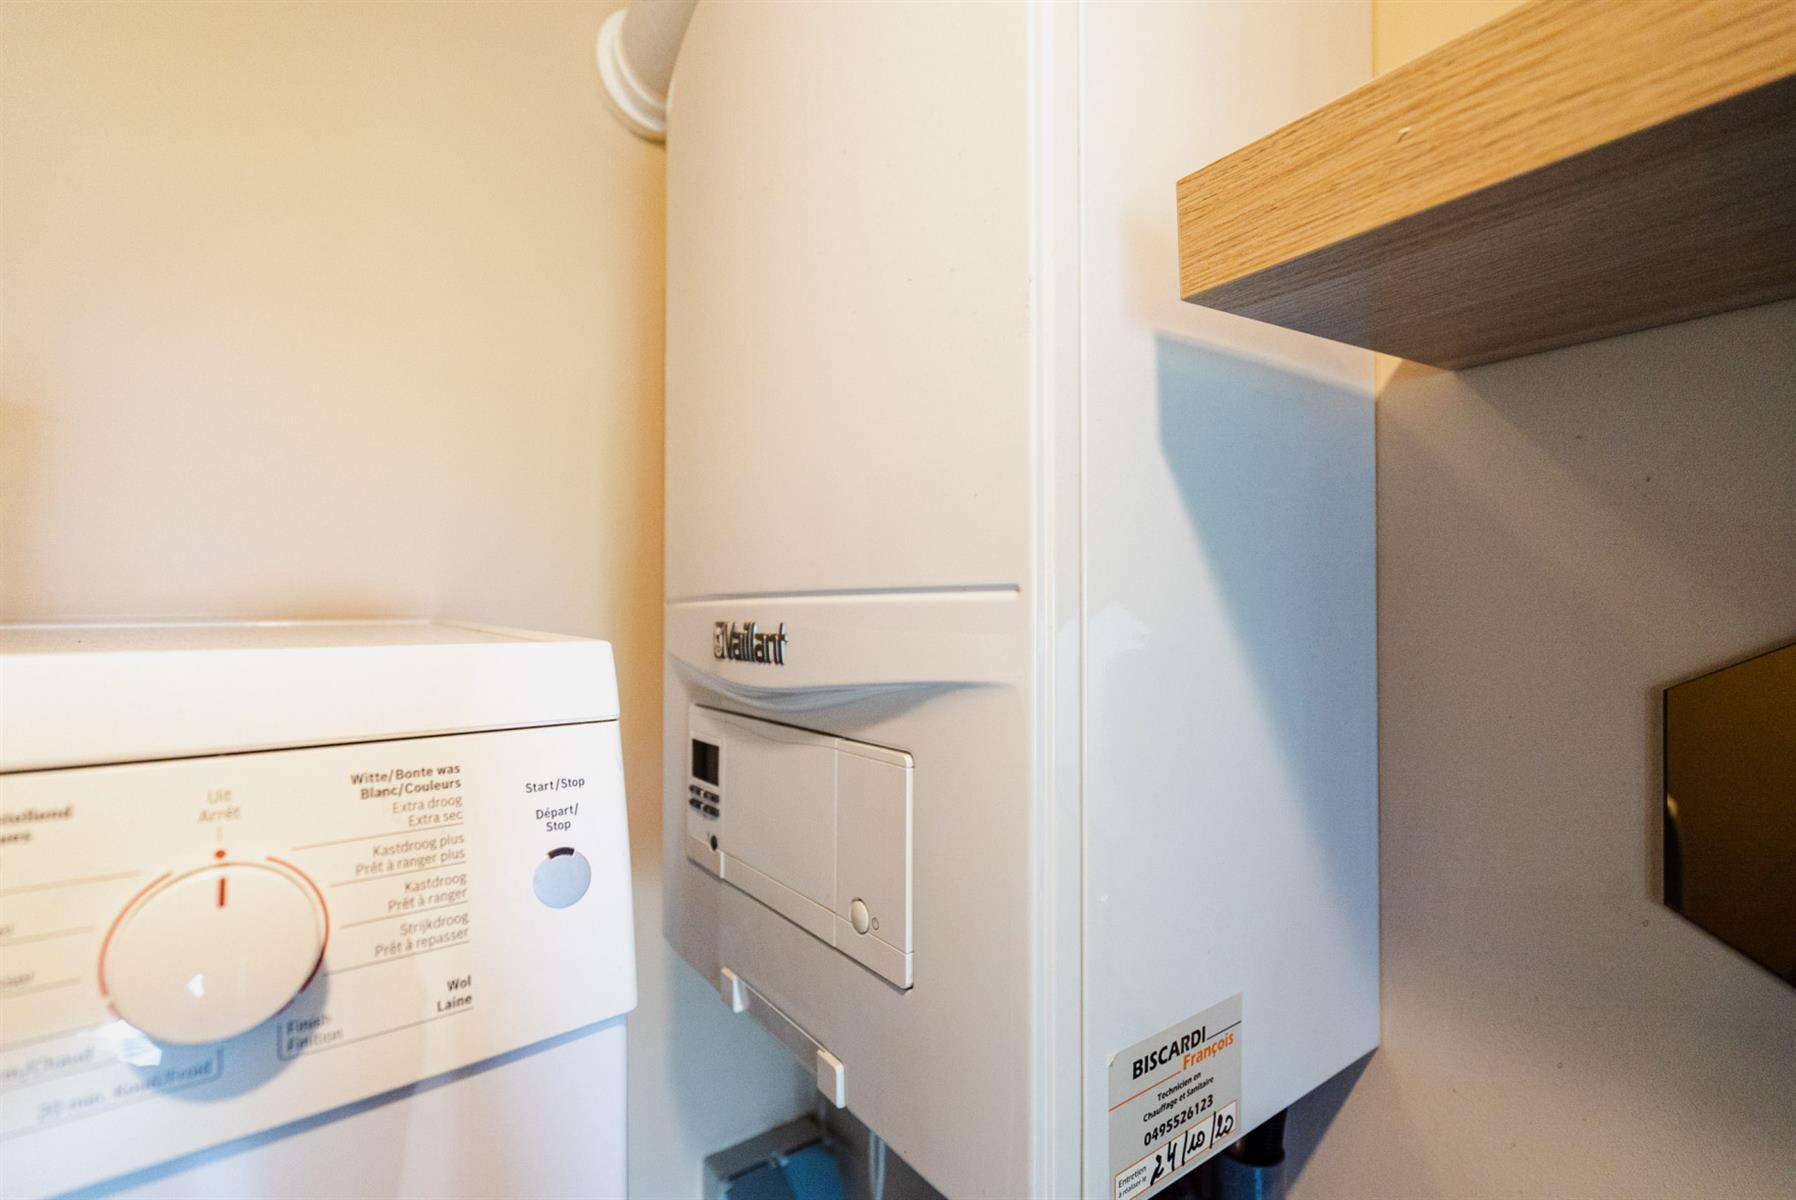 Appartement - Grâce-hollogne - #4364483-15